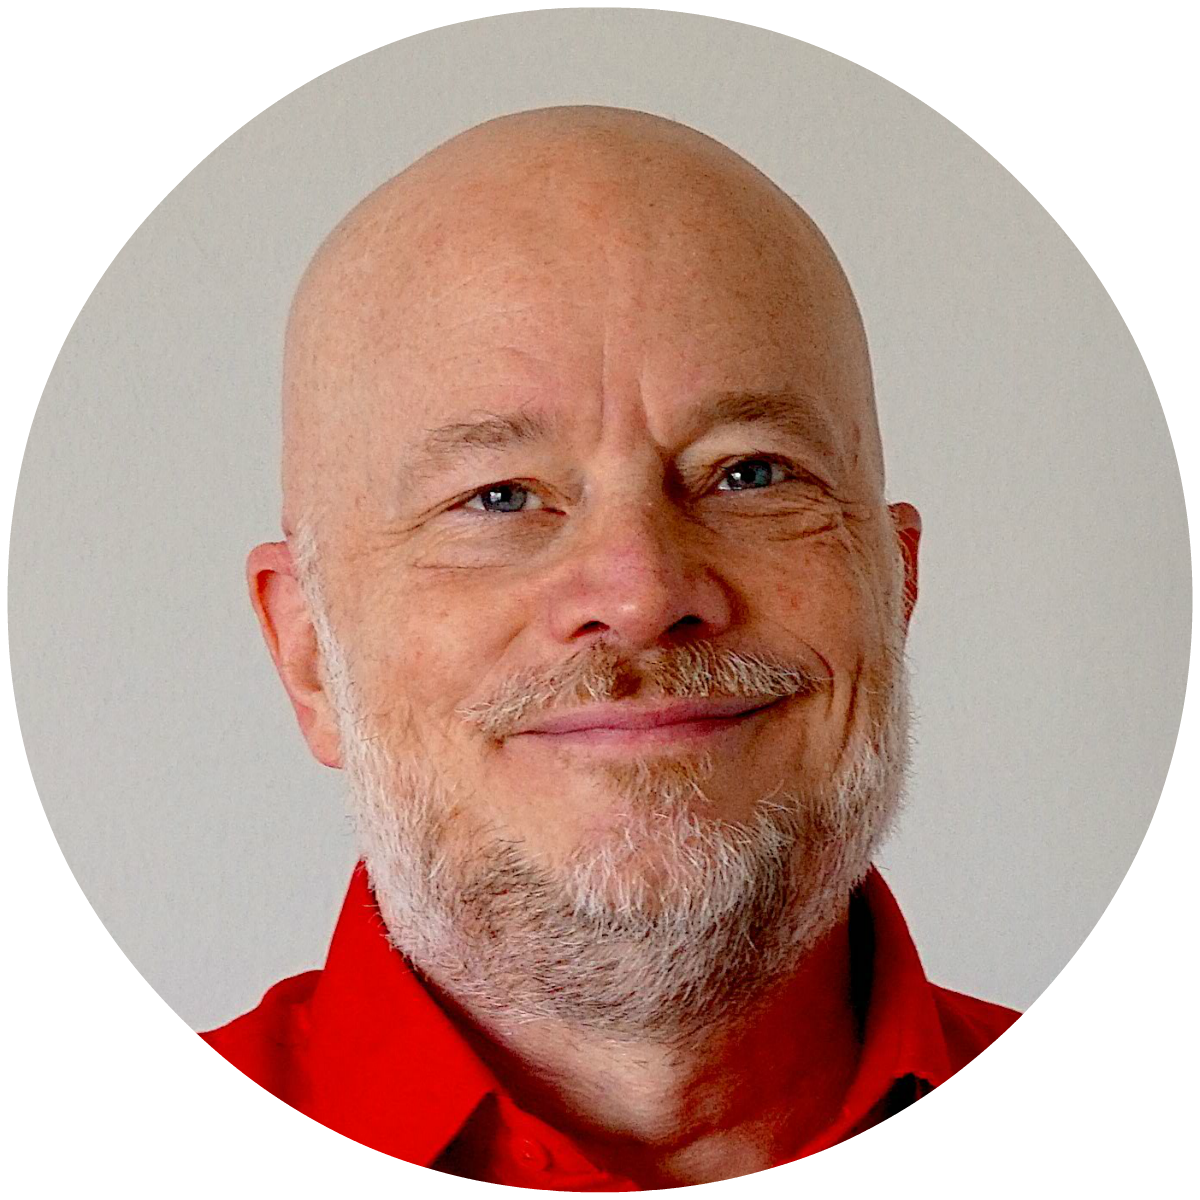 Jason Barnard close up photo in red t-shirt